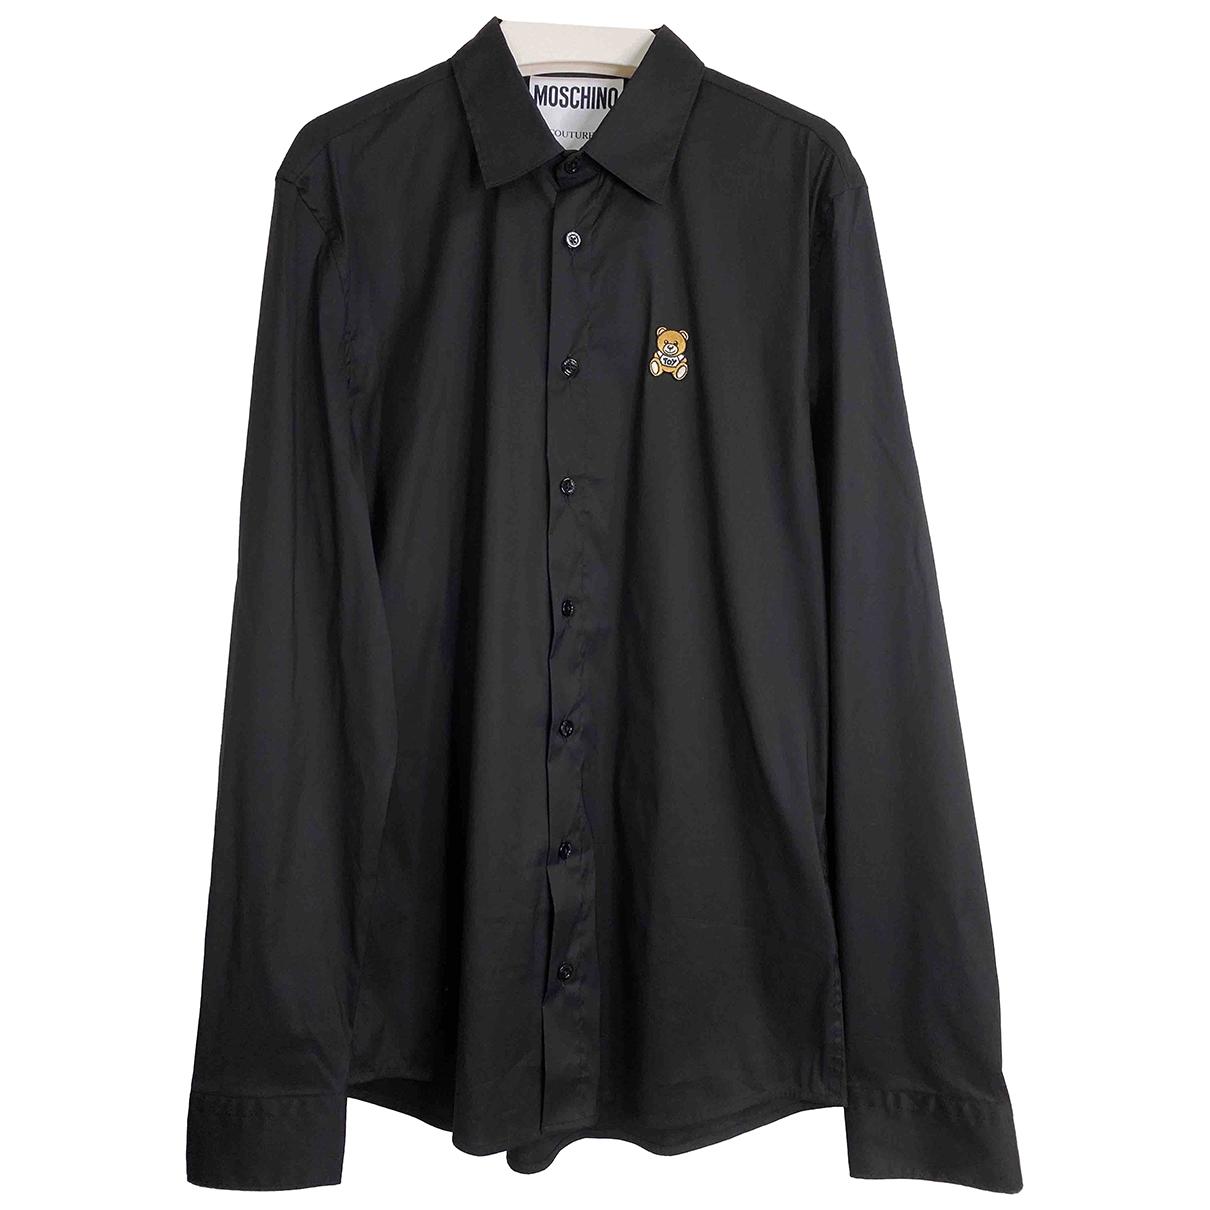 Moschino \N Black Cotton Shirts for Men 39 EU (tour de cou / collar)